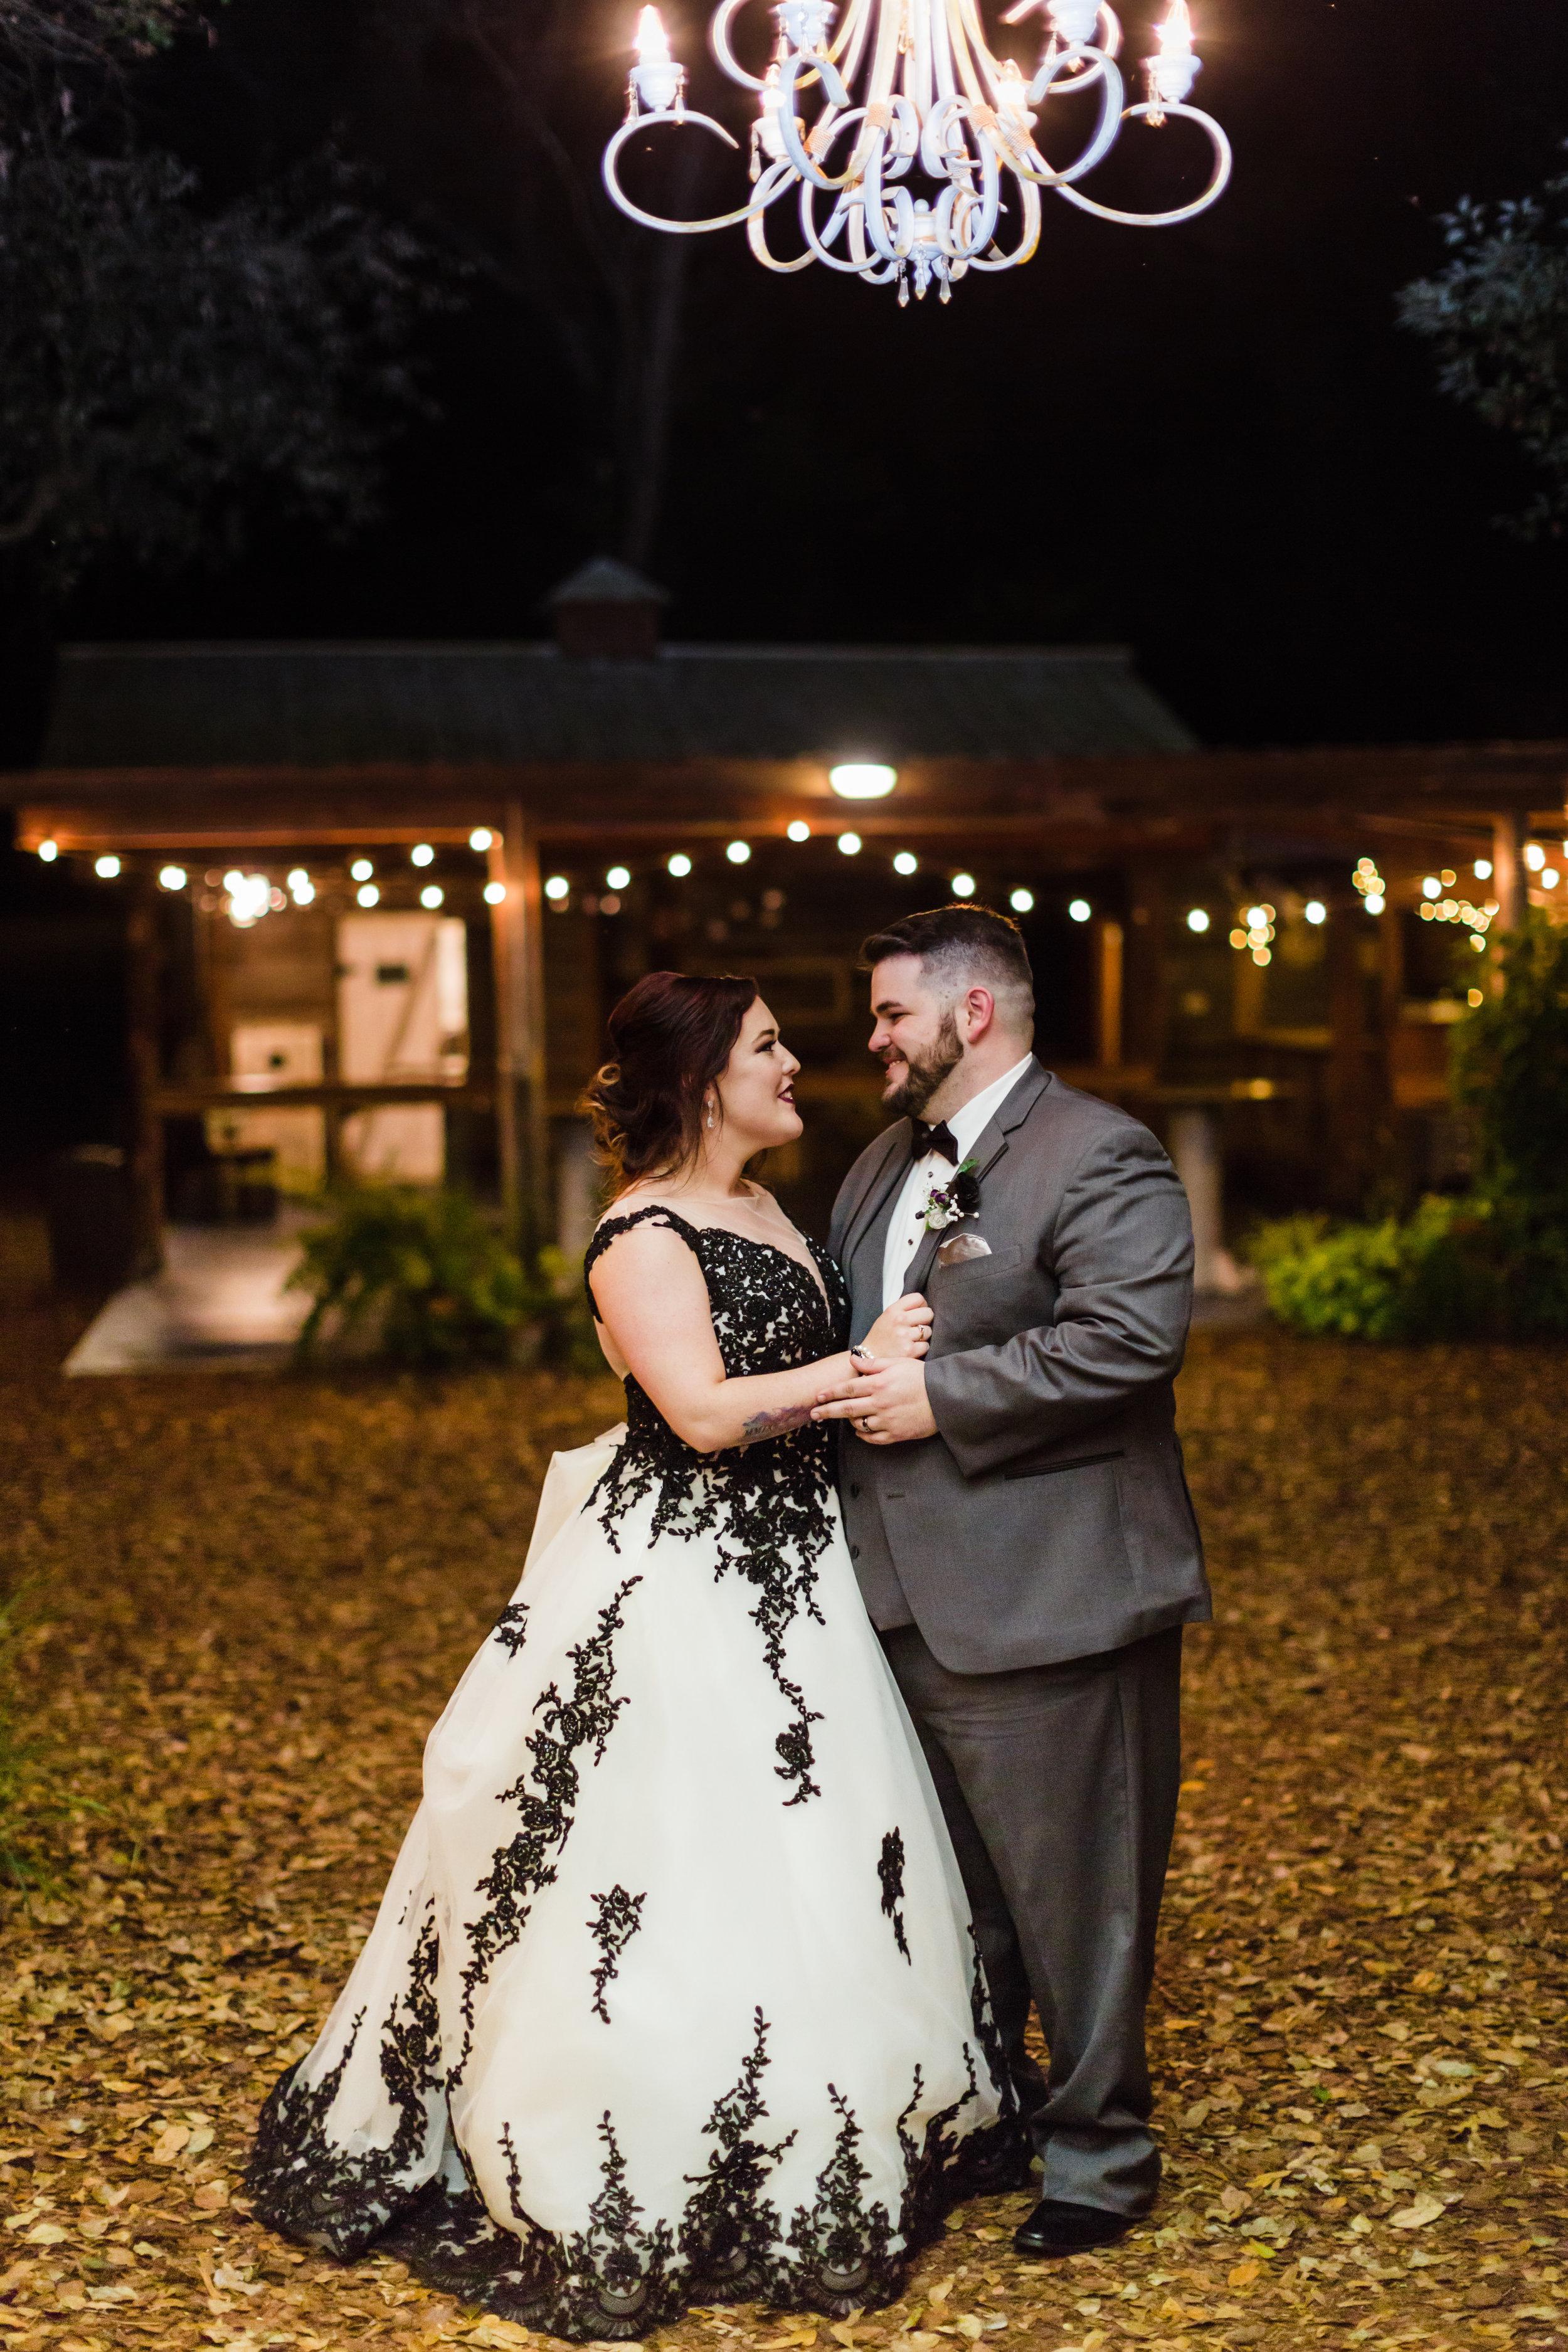 2019.01.12 Ashley and Nathan Bridle Oaks Wedding (1031 of 1091).jpg